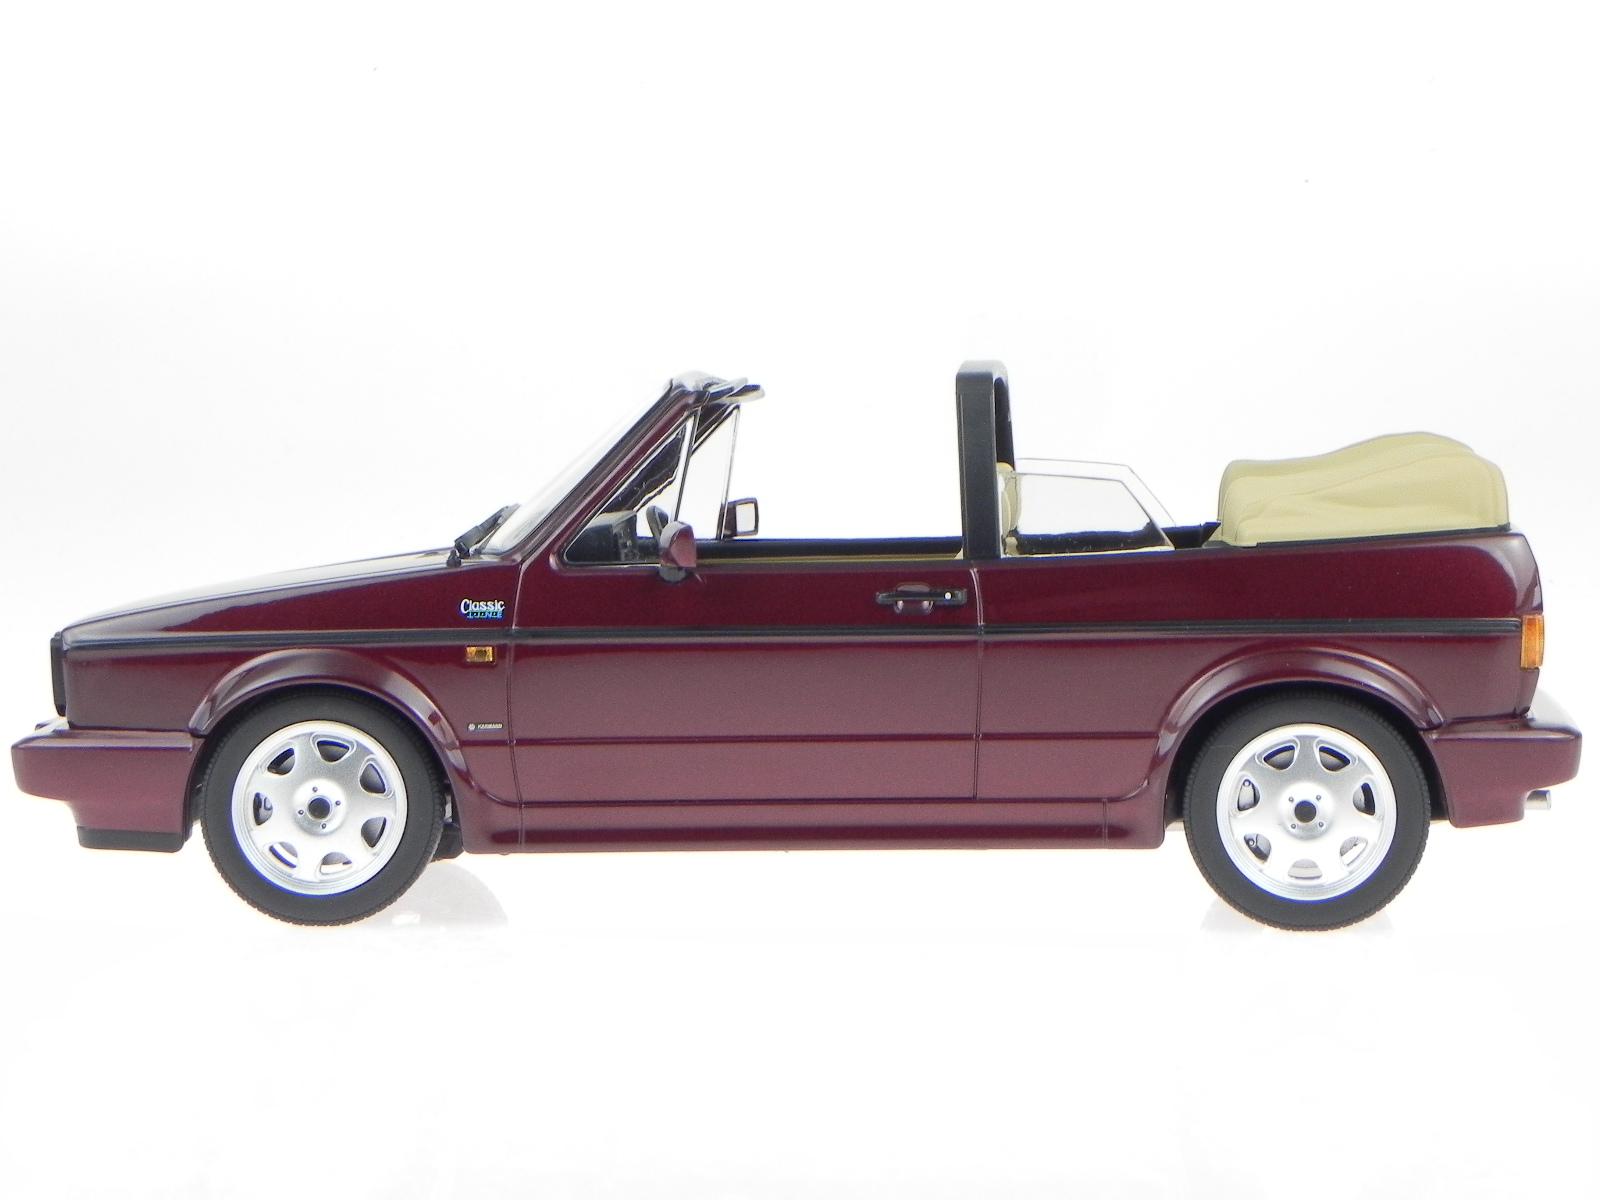 vw golf 1 cabrio classic line 1992 rot modellauto 188403. Black Bedroom Furniture Sets. Home Design Ideas